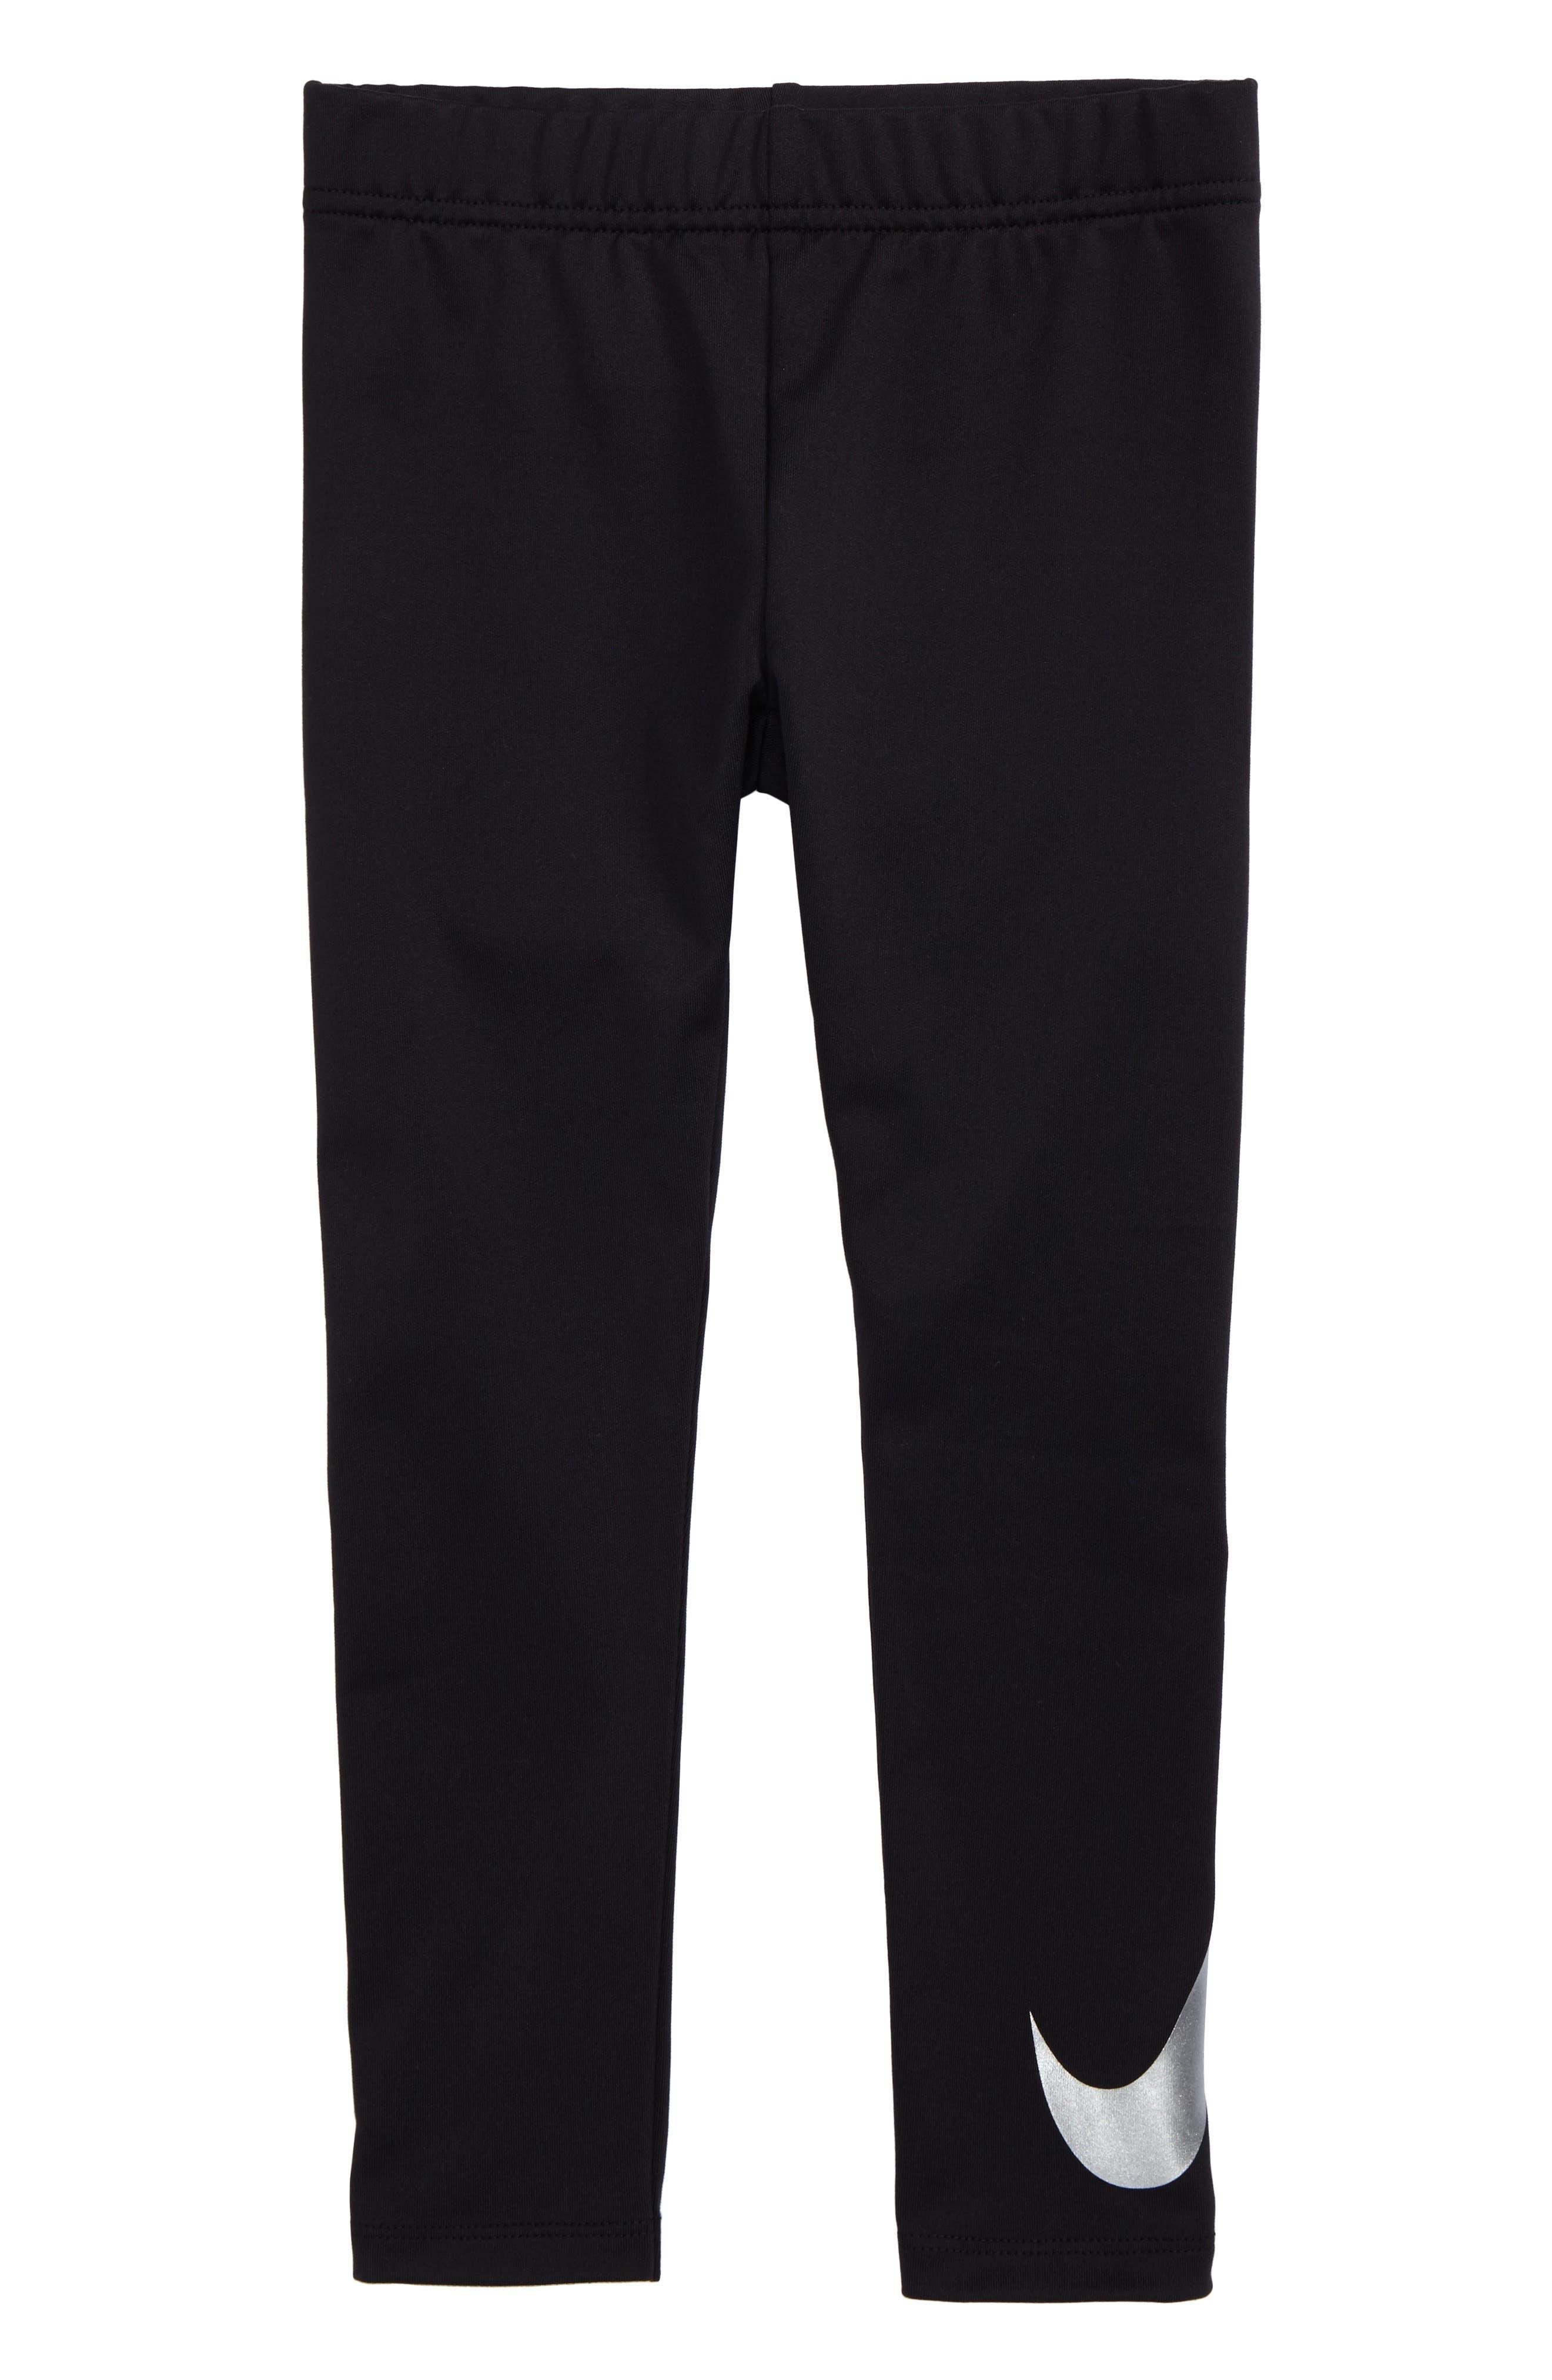 Dry Iridescent Leggings,                         Main,                         color, BLACK